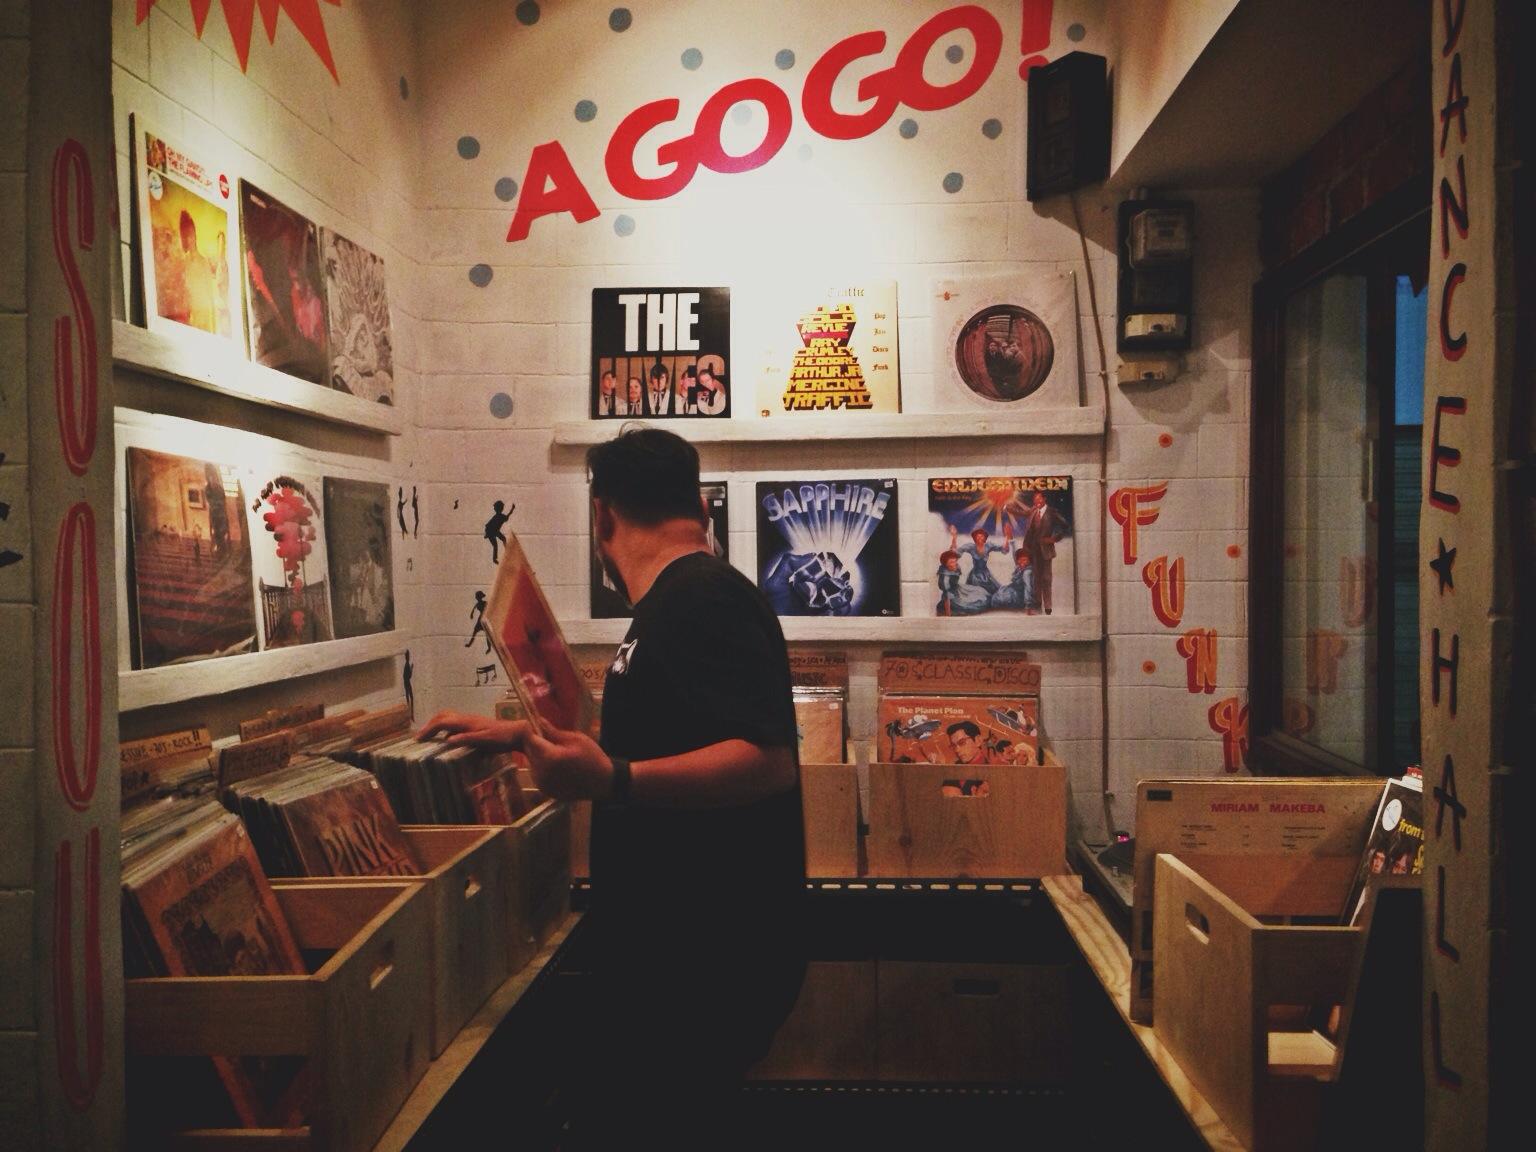 Interior Laidback Blues Record Store yang ceria.